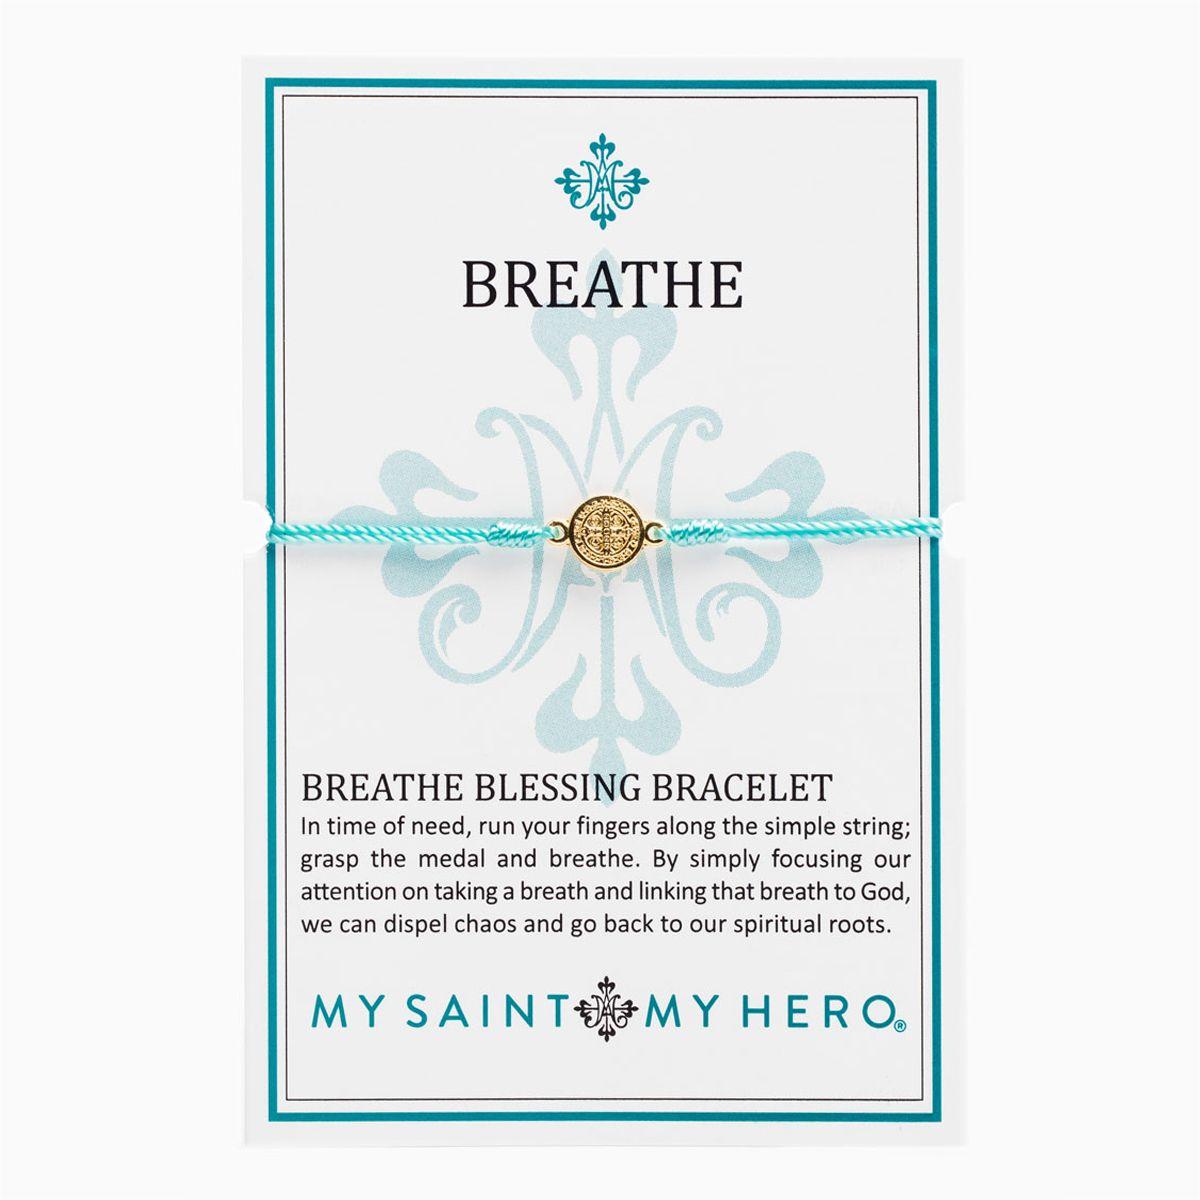 Blessing Bracelets Breathe Mint - Gold Metal